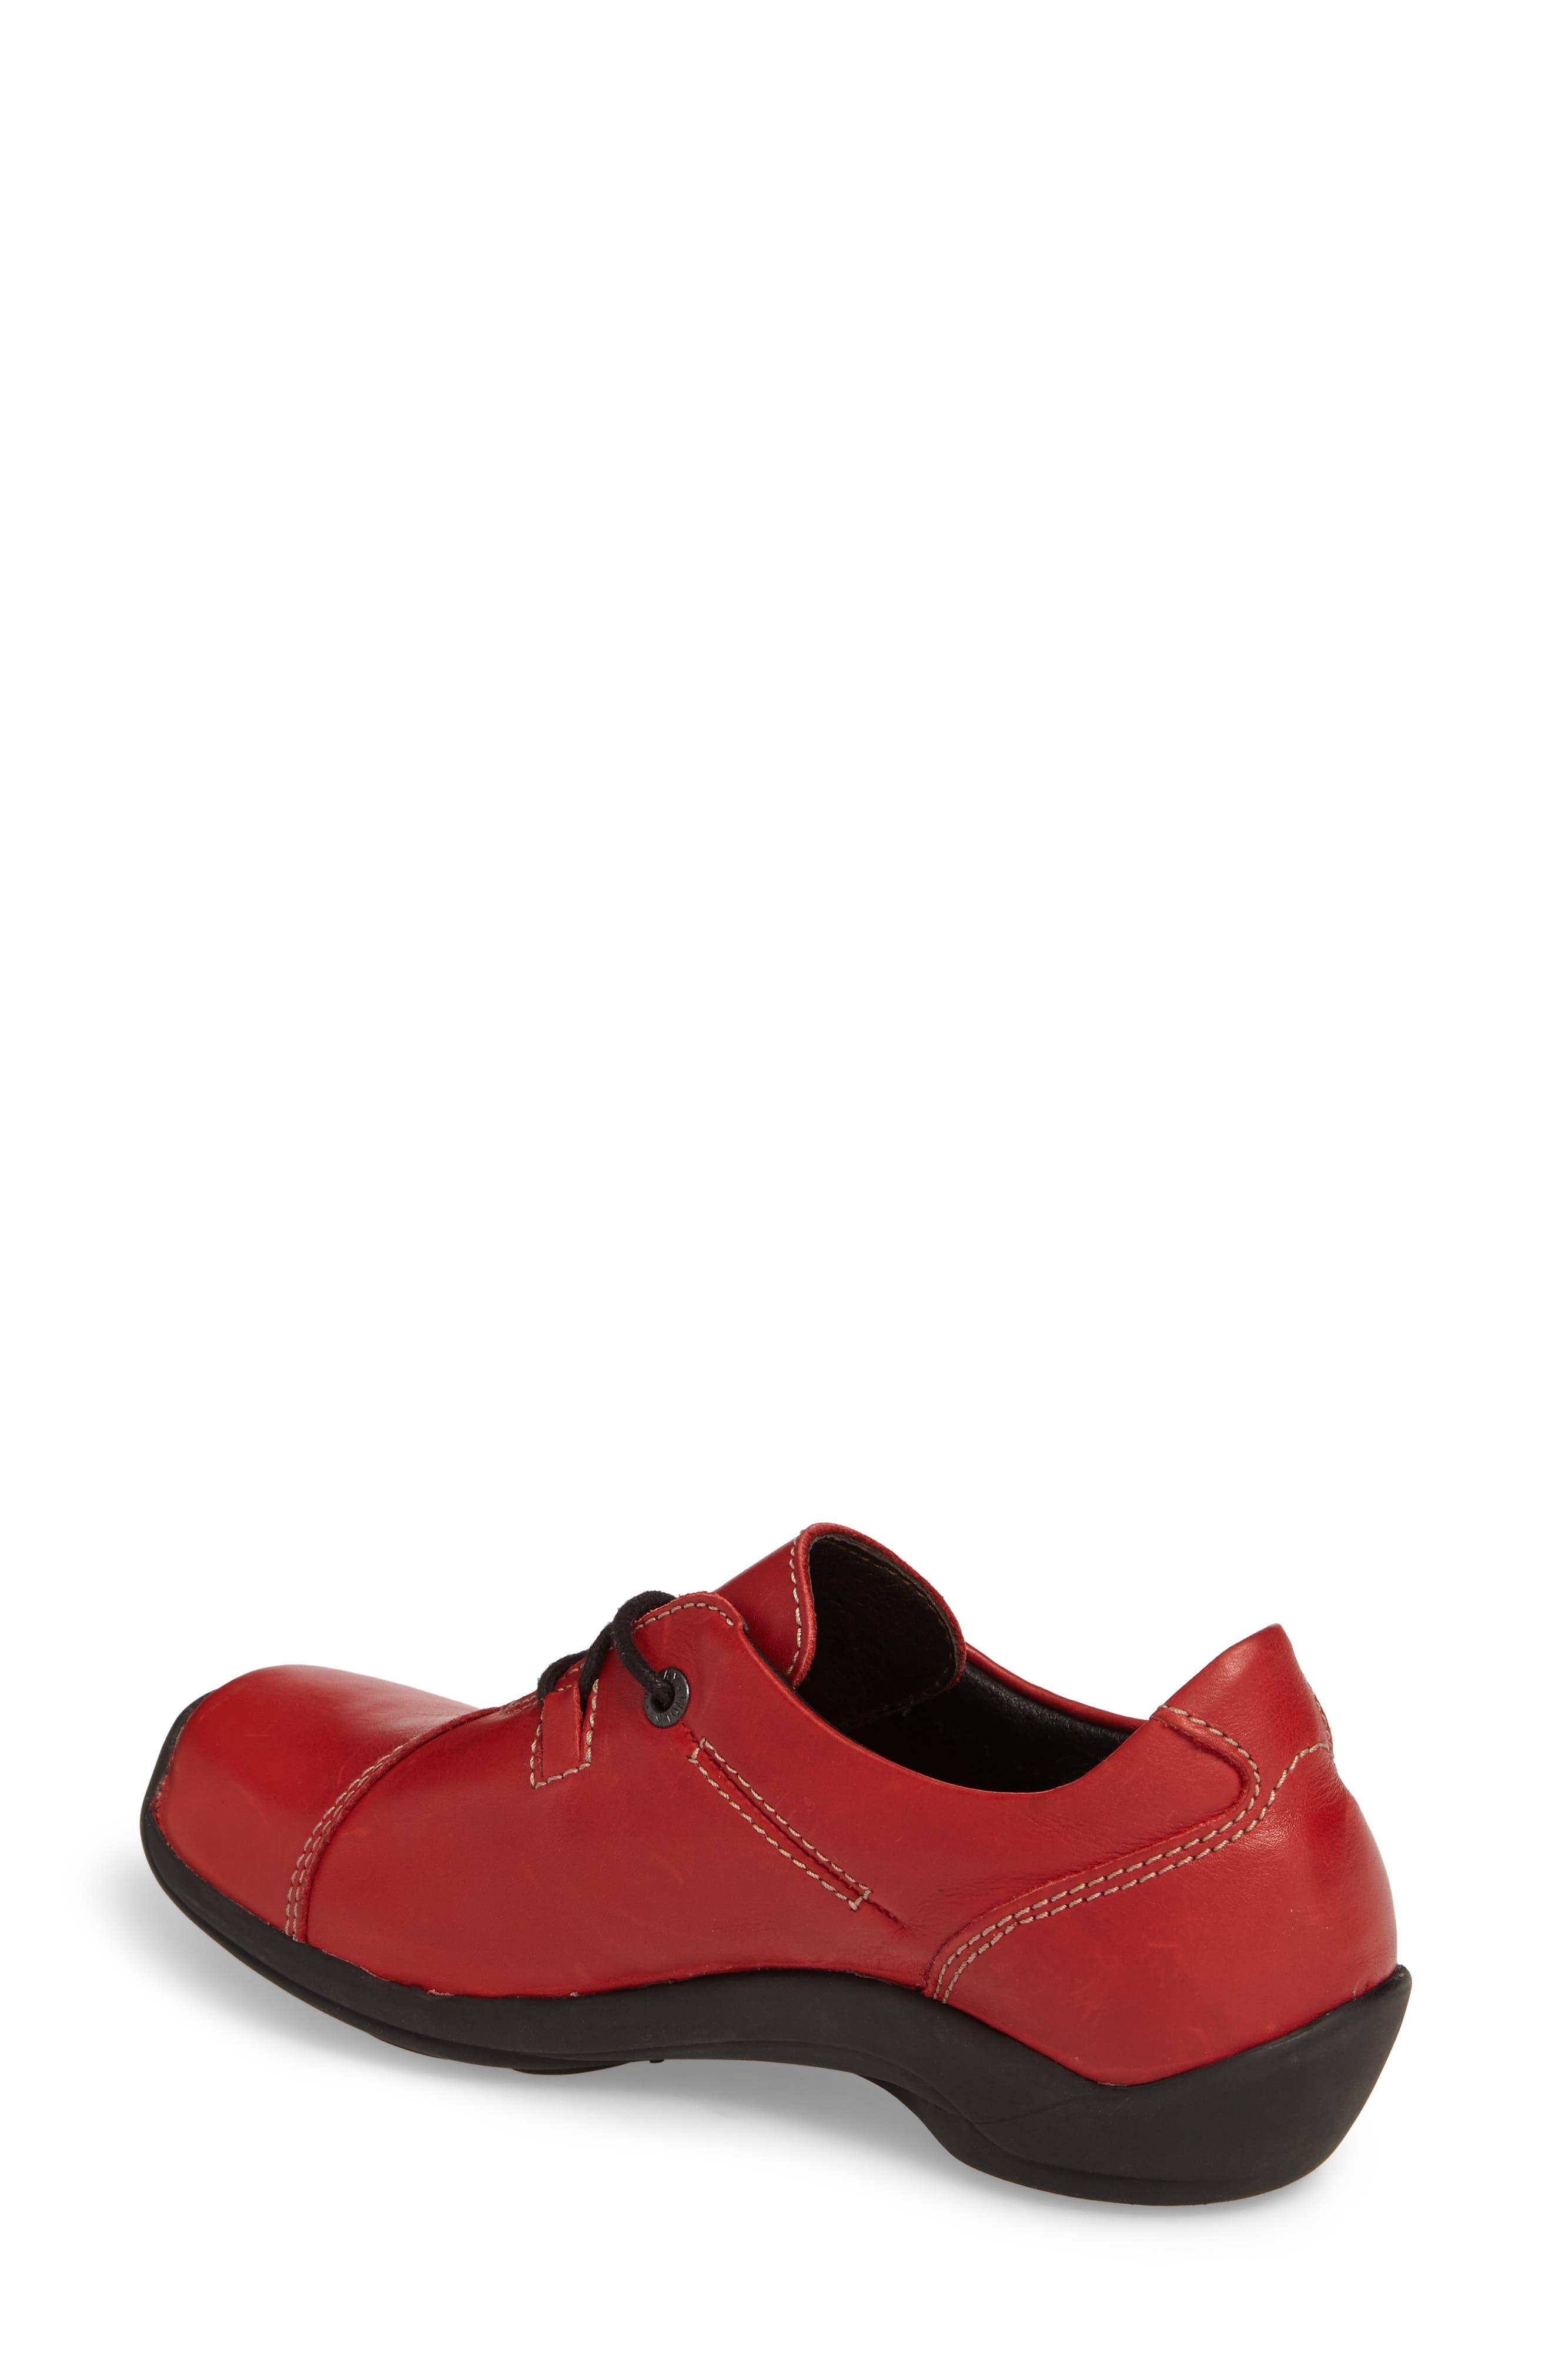 Alternate Image 2  - Wolky Rosa Sneaker (Women)